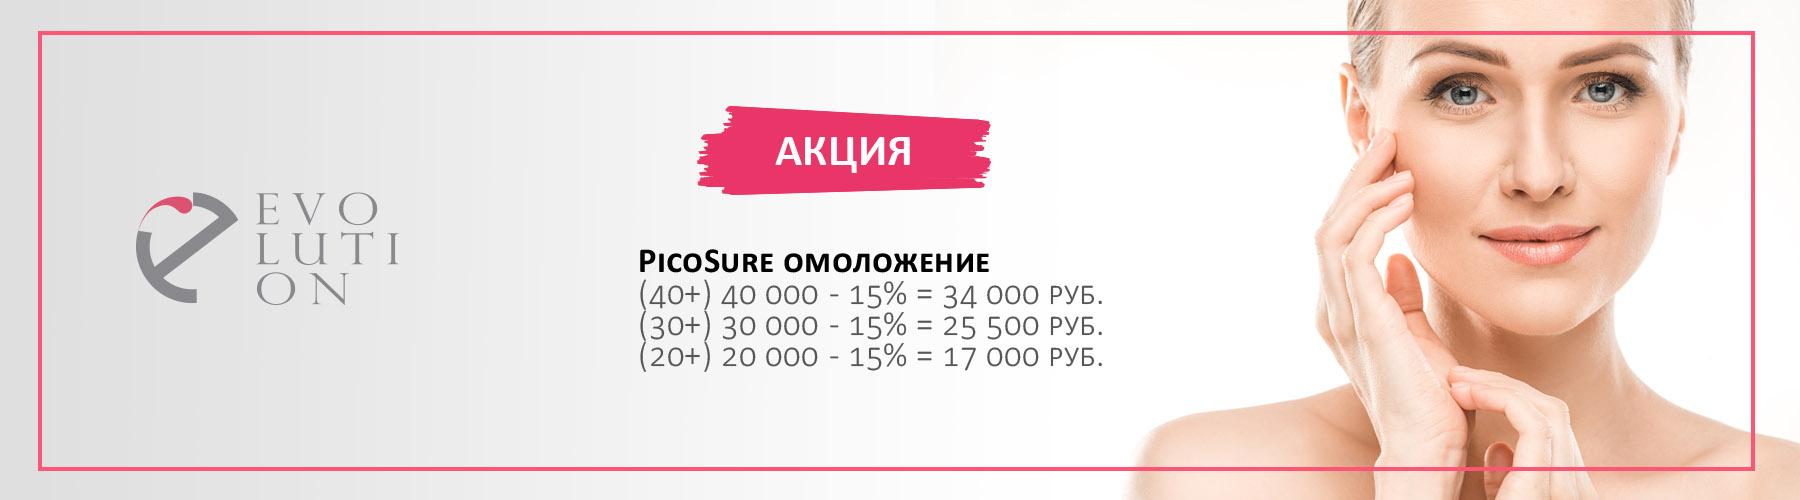 PicoSure омоложение